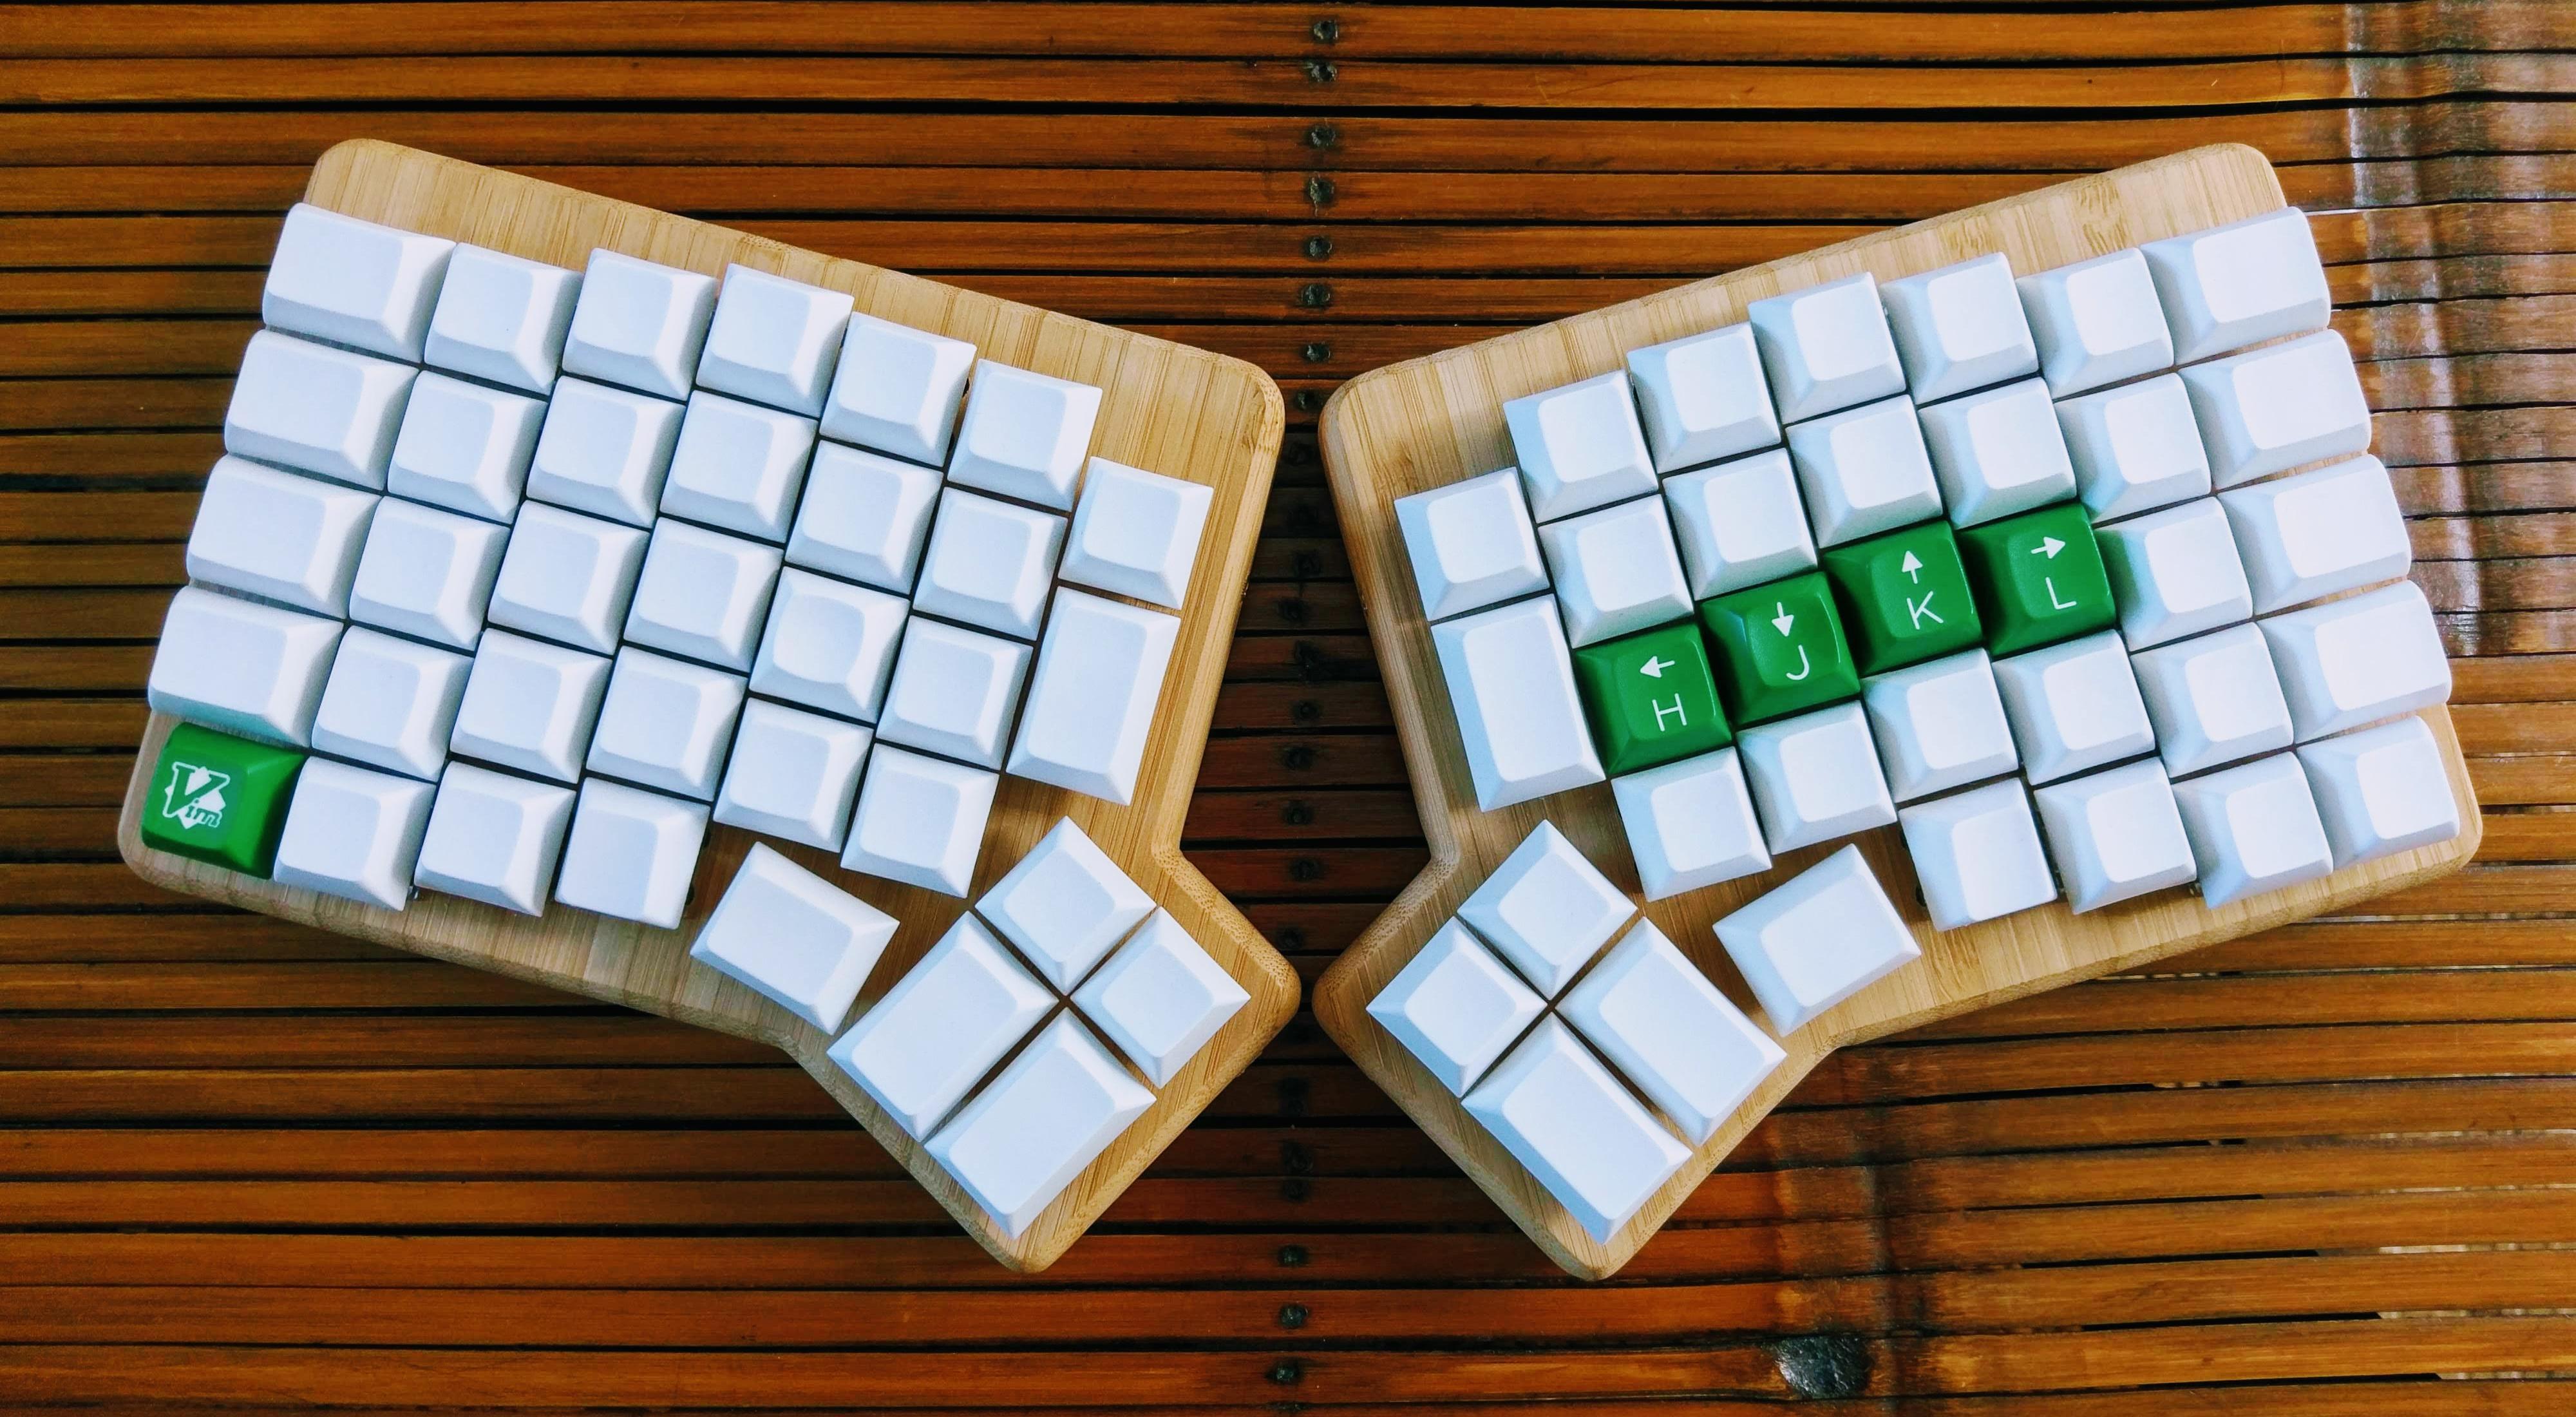 The Redox open hardware keyboard